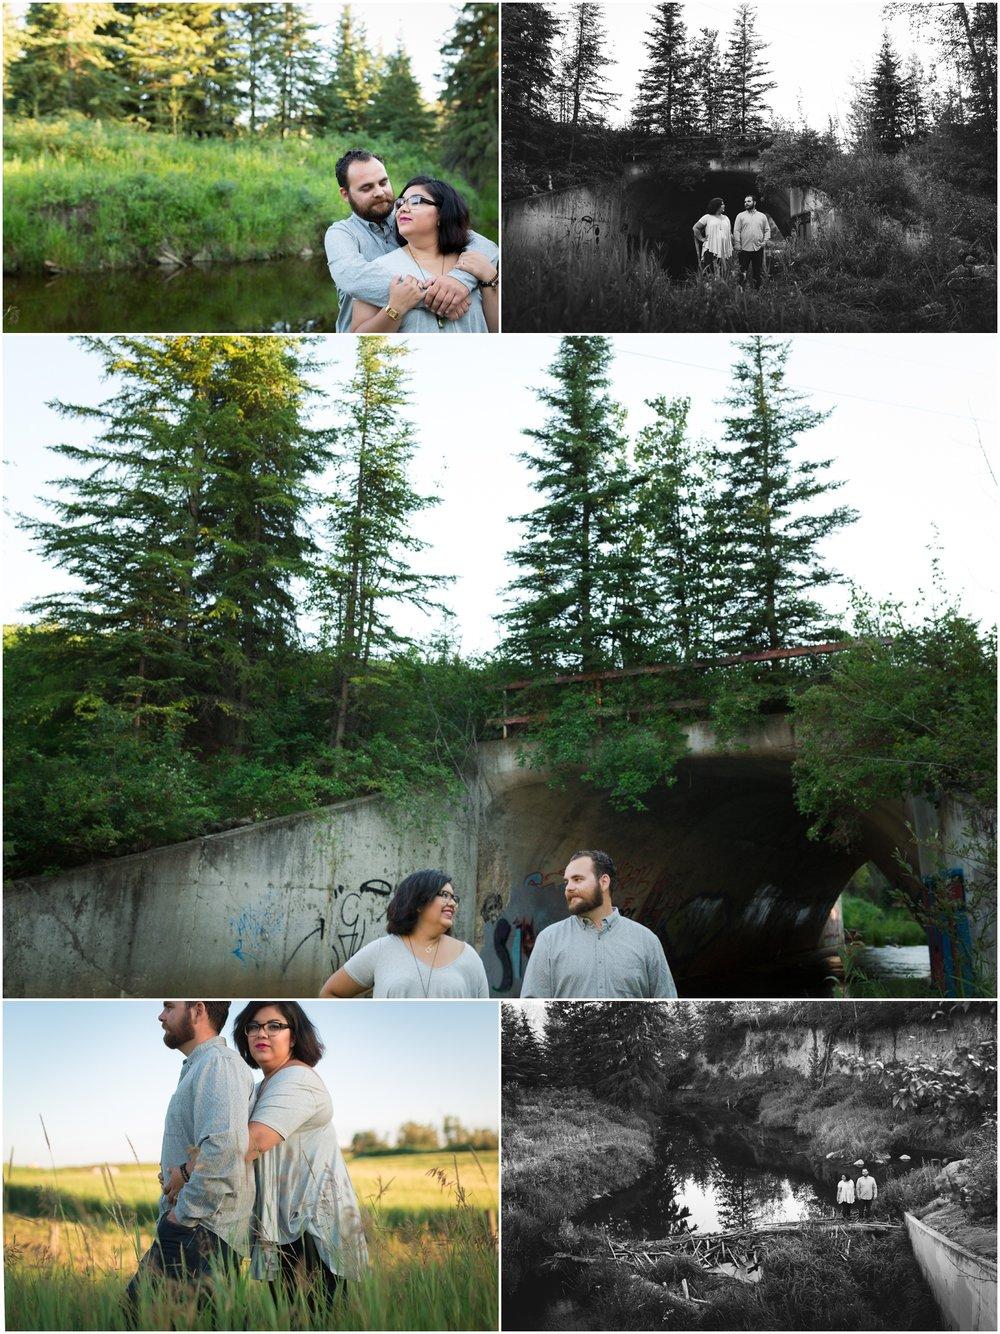 Edmonton couples engagement photographer best of 2016 july